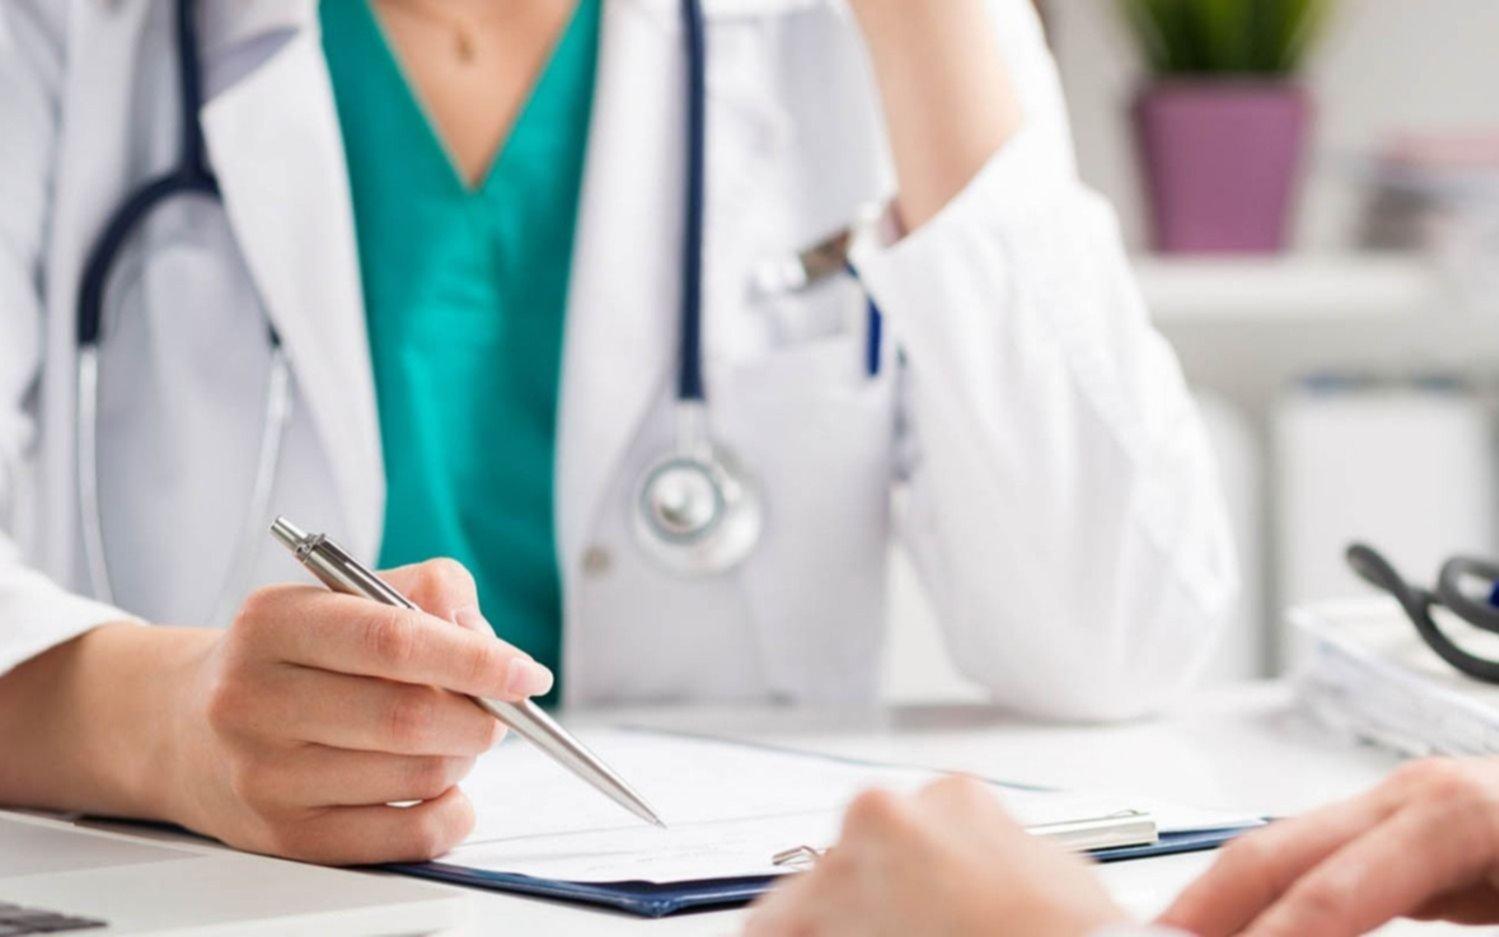 Pagan a médicos platenses y negociación por honorarios